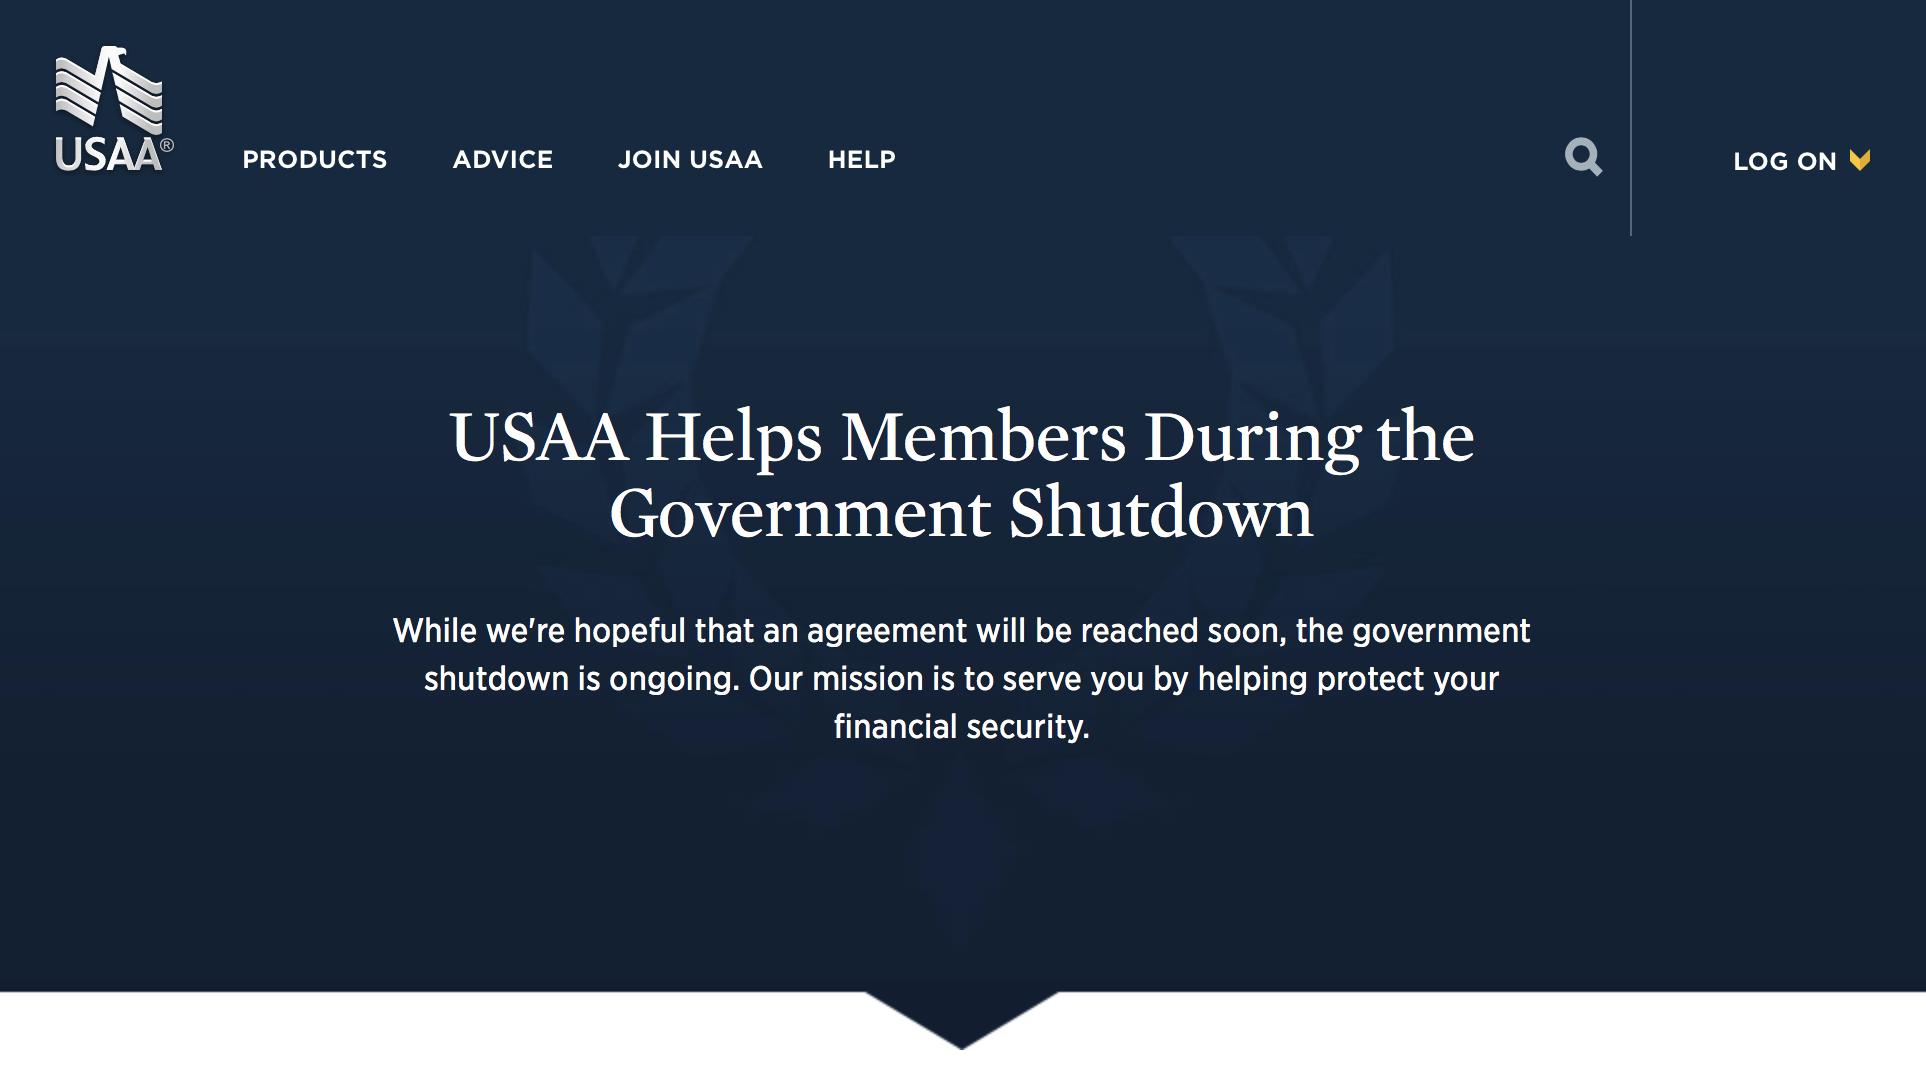 USAA government shutdown